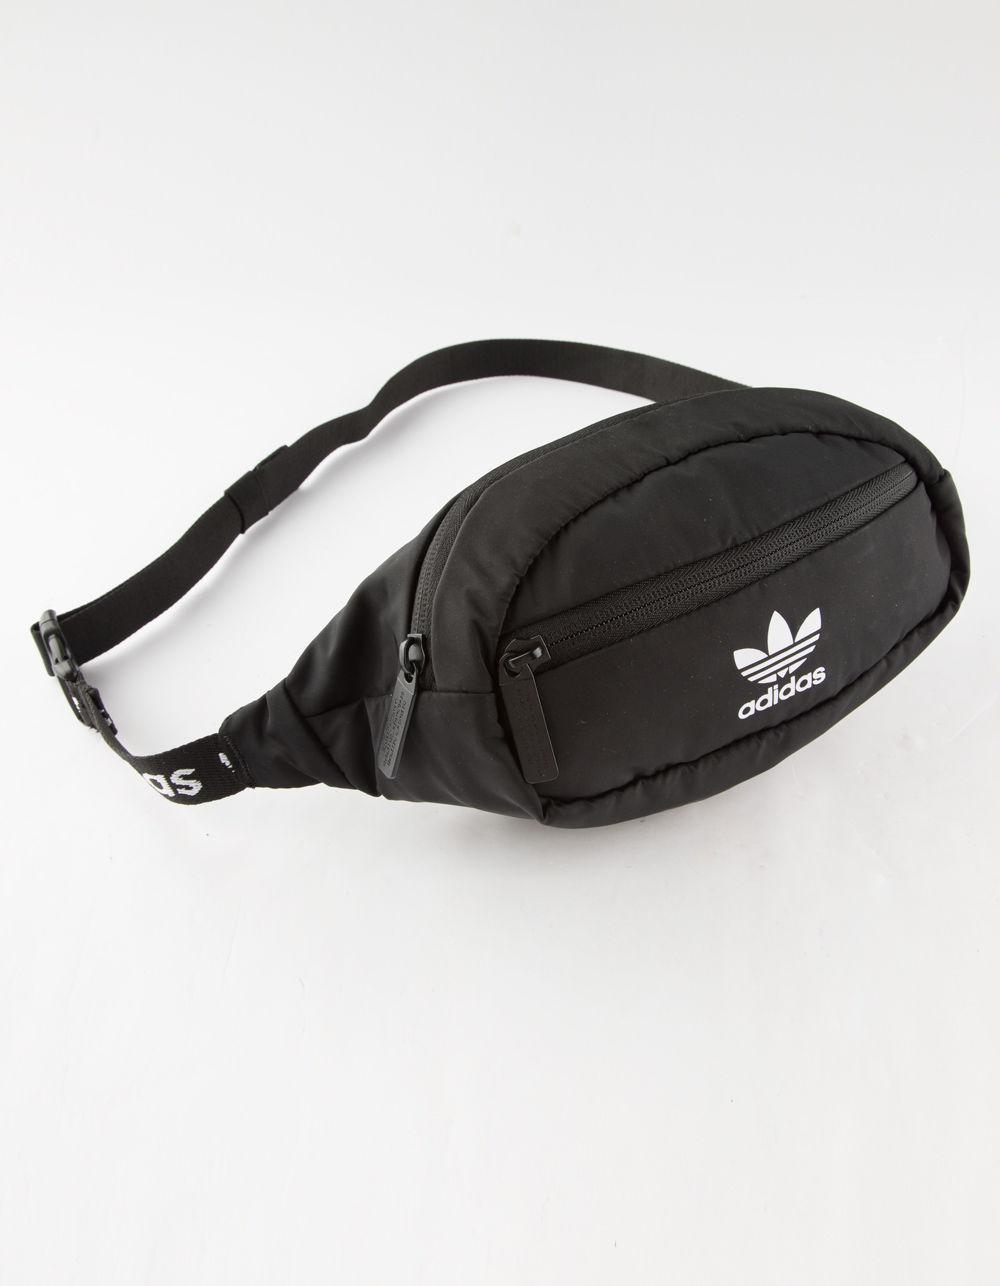 Adidas - Originals Black   White Fanny Pack for Men - Lyst. View fullscreen d605b53920